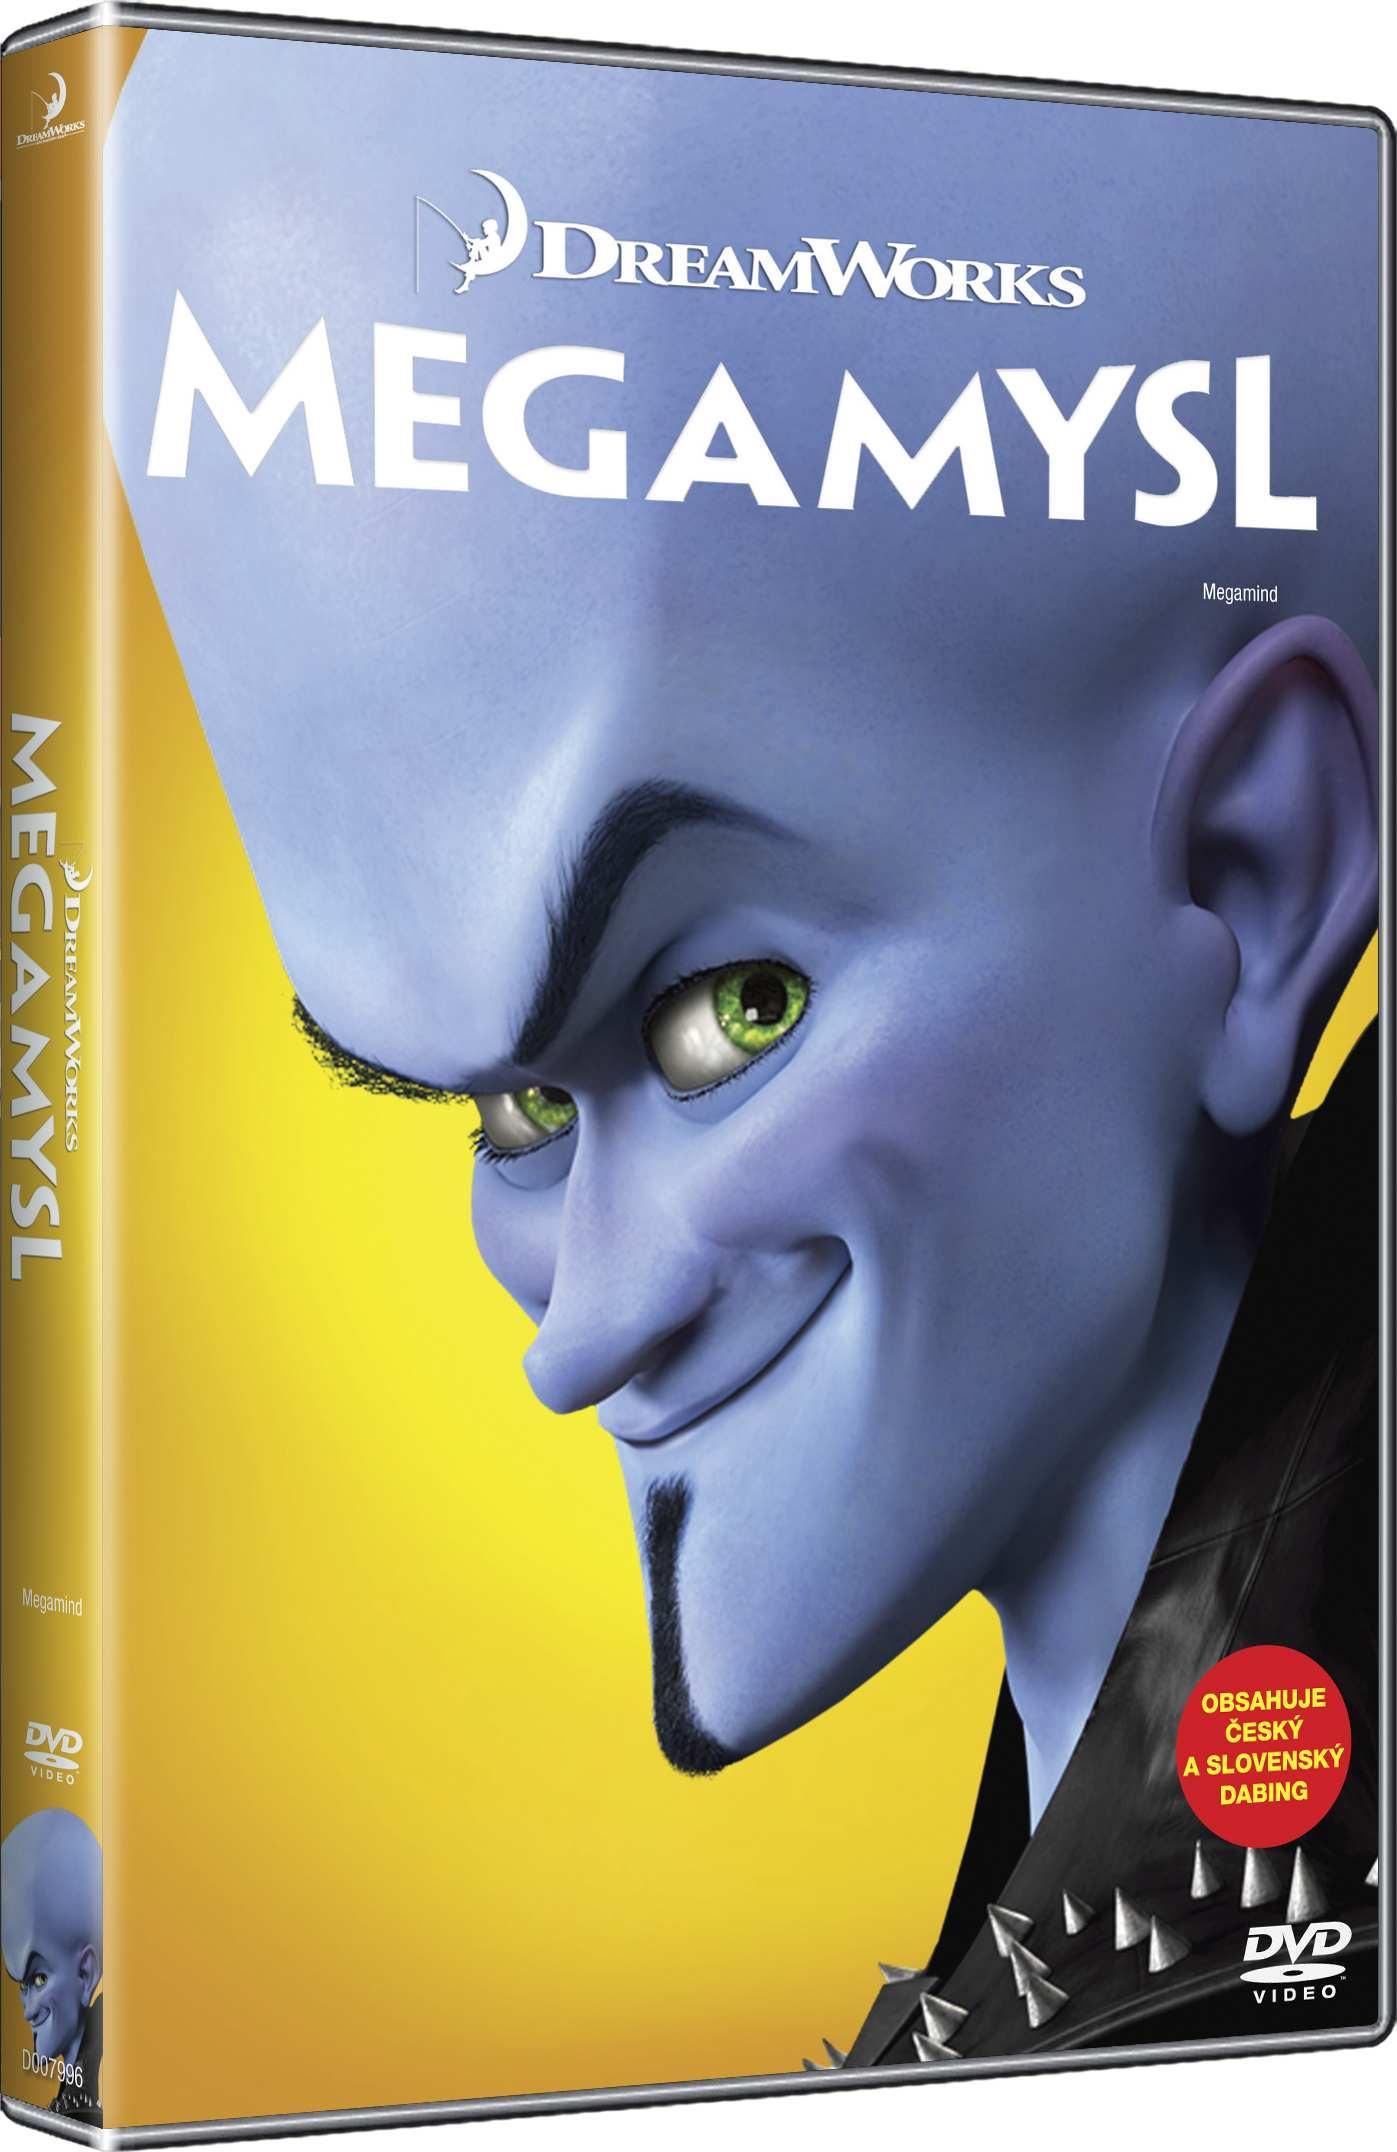 MEGAMYSL (Big Face) - DVD